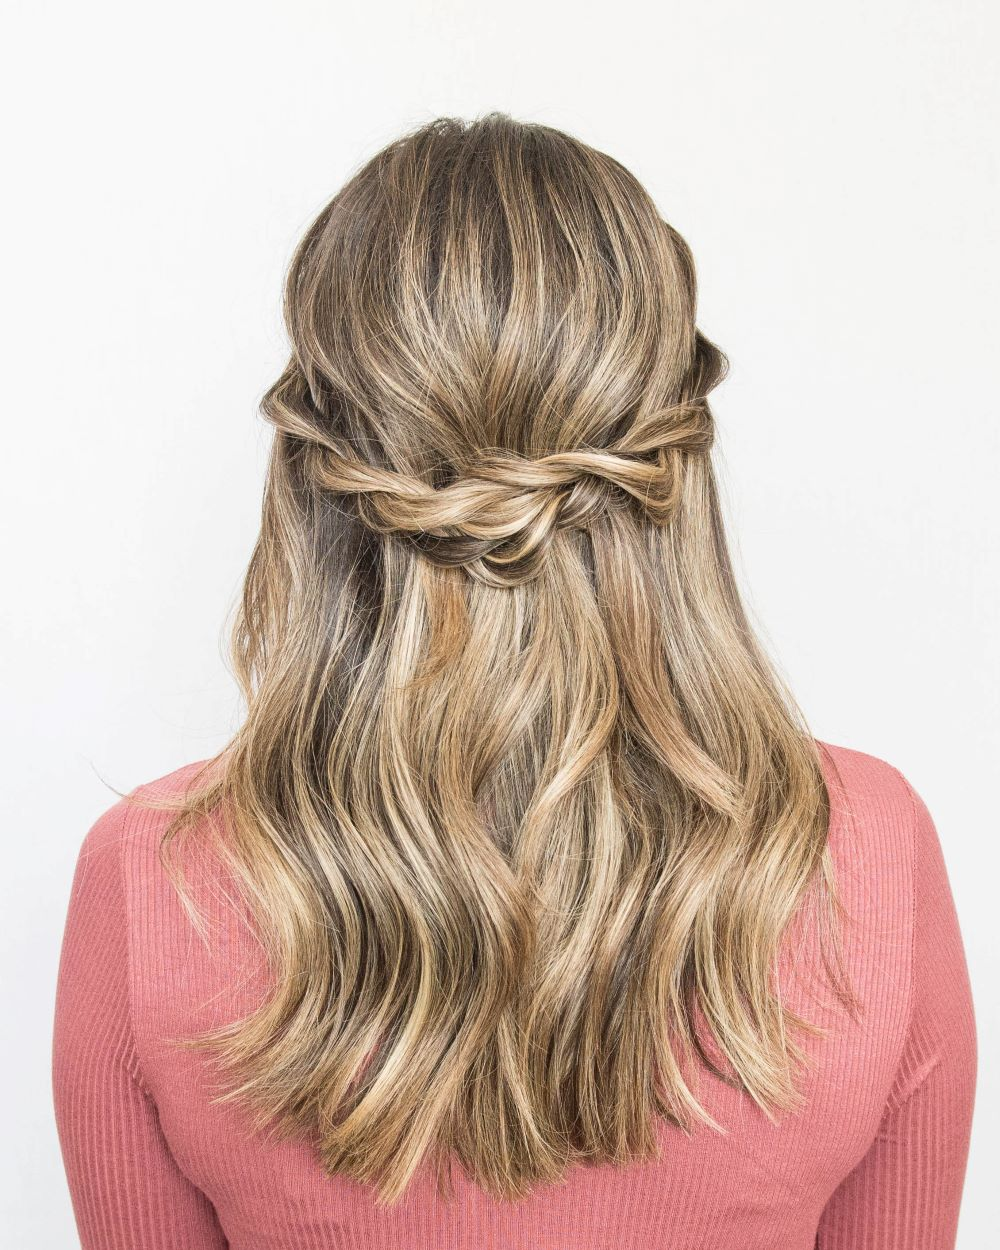 Astonishing Half Up Half Down Hairstyle With Braid Tutorial Lulus Com Schematic Wiring Diagrams Amerangerunnerswayorg